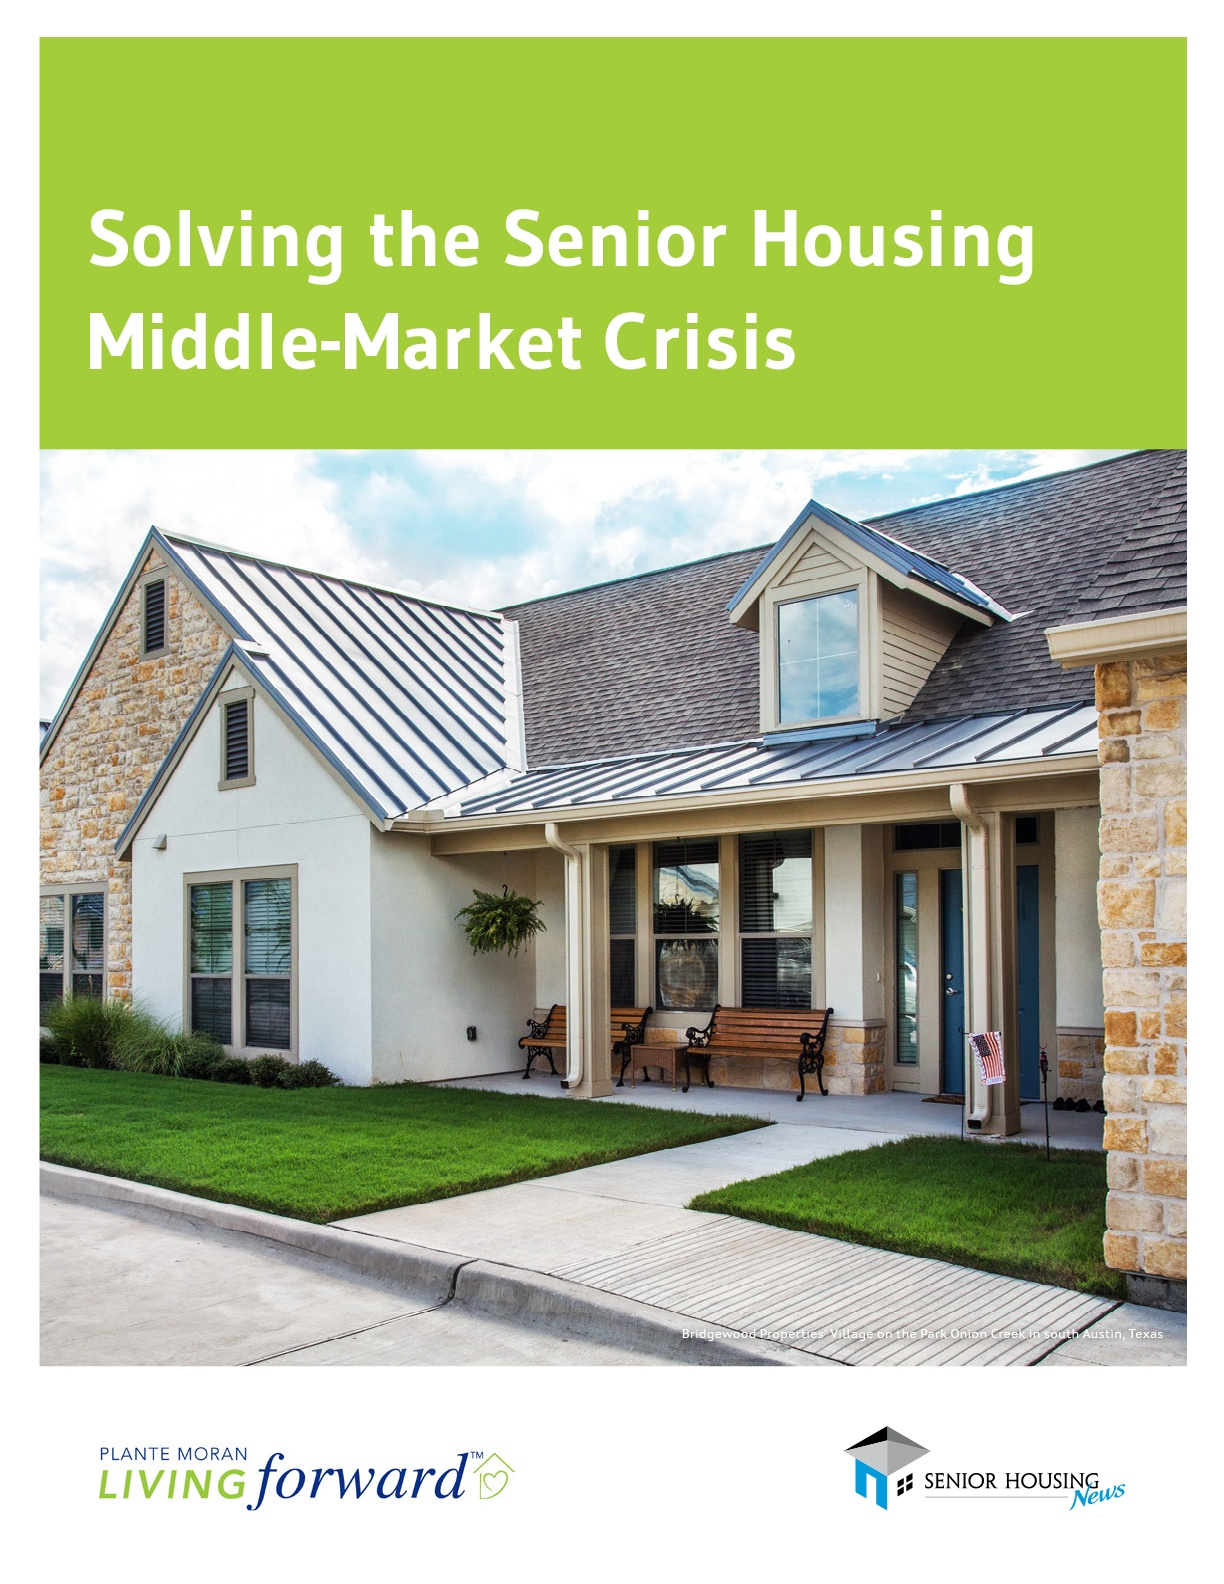 Solving the Senior Housing Middle-Market Crisis